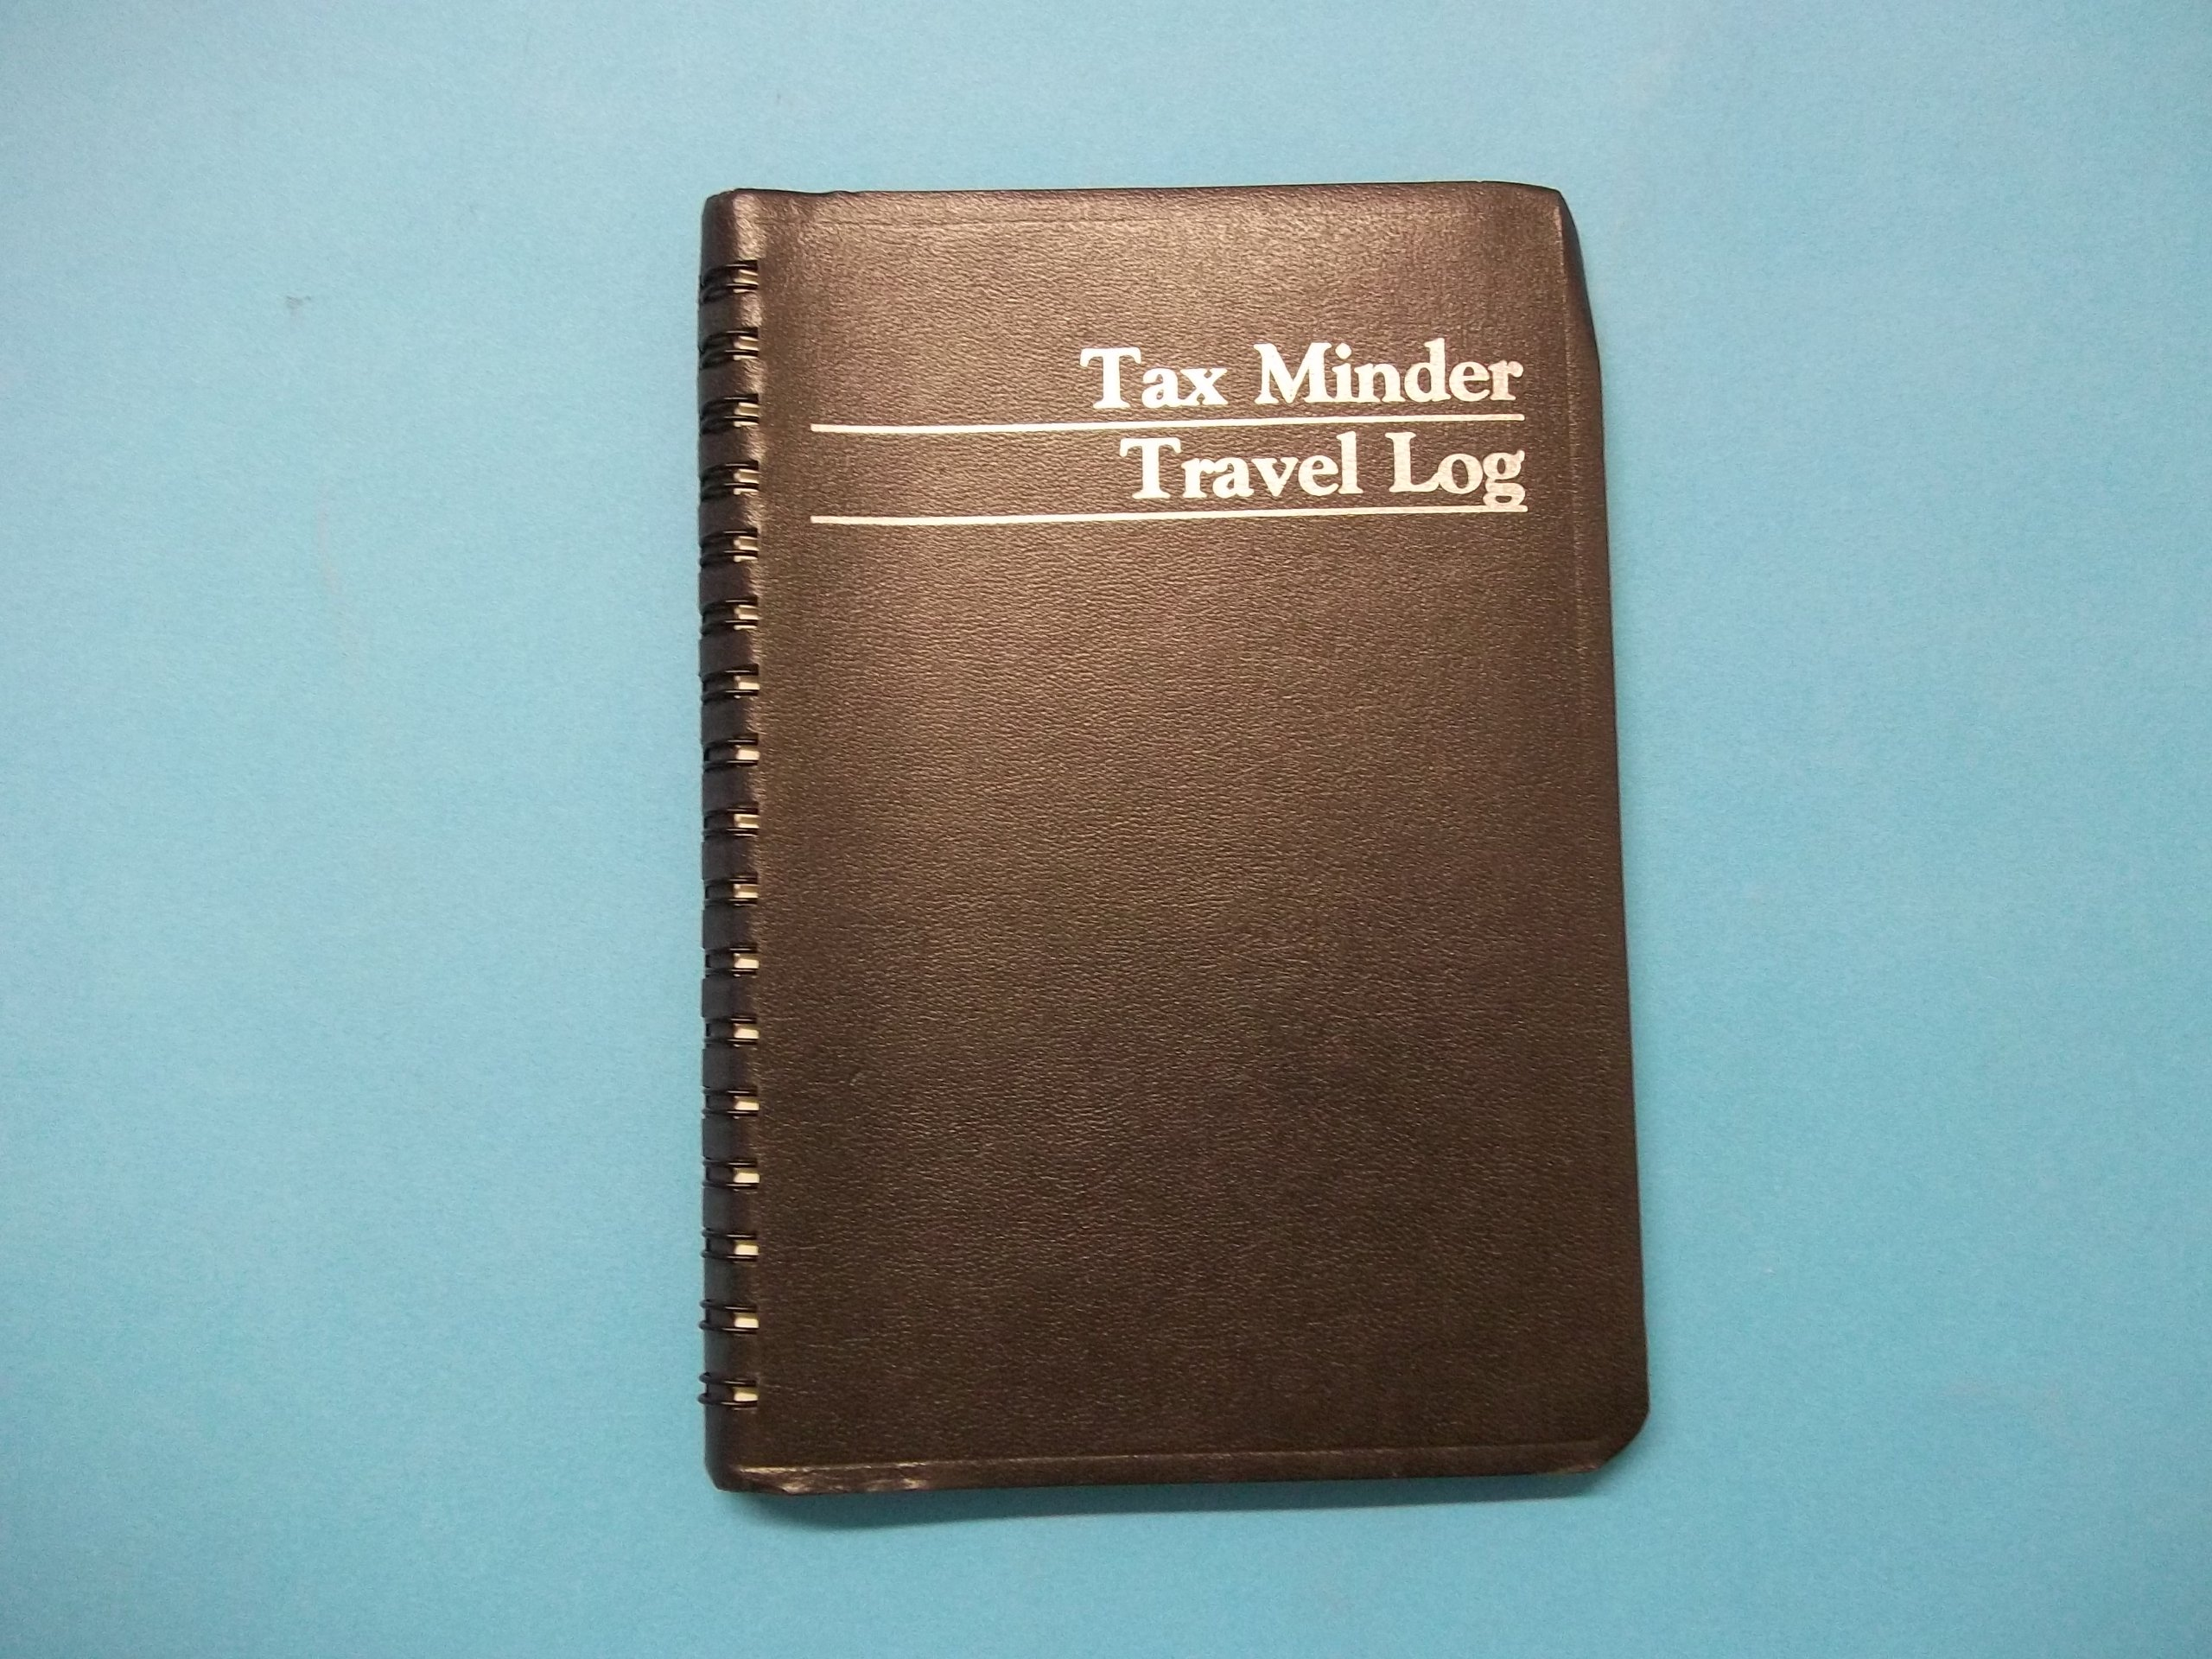 The Guilford Line G750 Tax Minder Travel Log 4 1/2'' (W) x 6 1/4'' (H) Black Spiral Bound